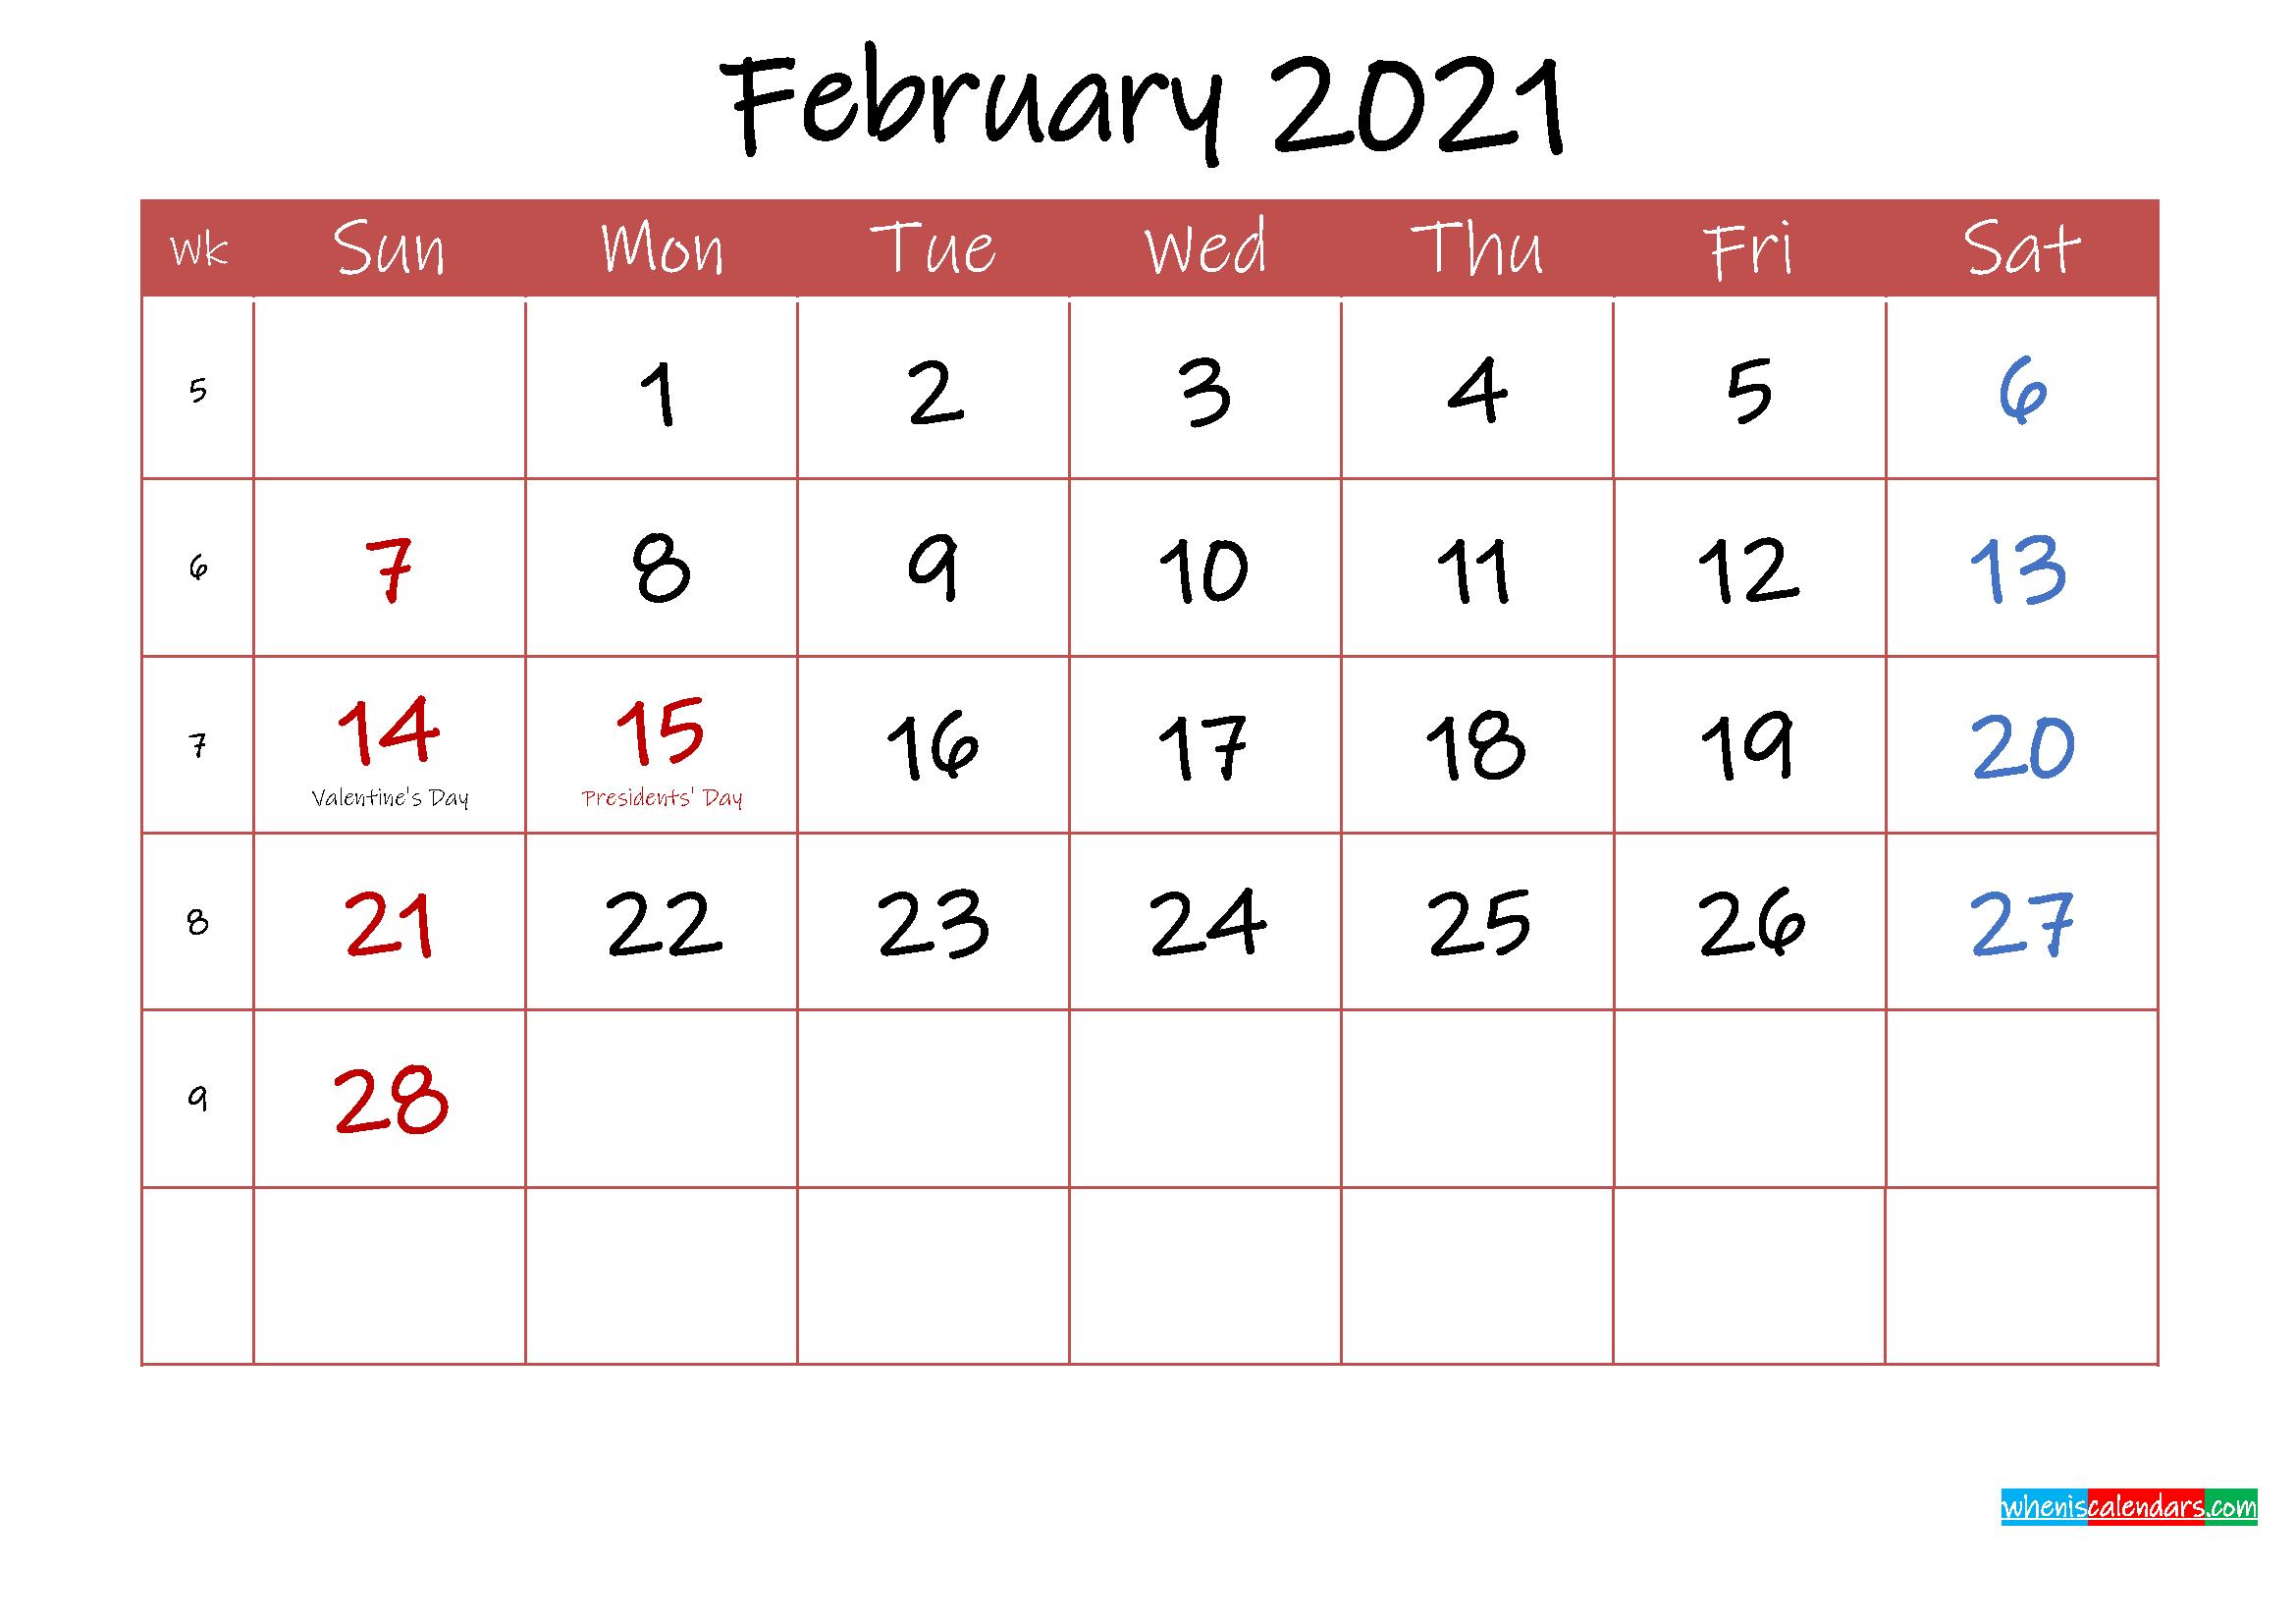 Printable February 2021 Calendar with Holidays